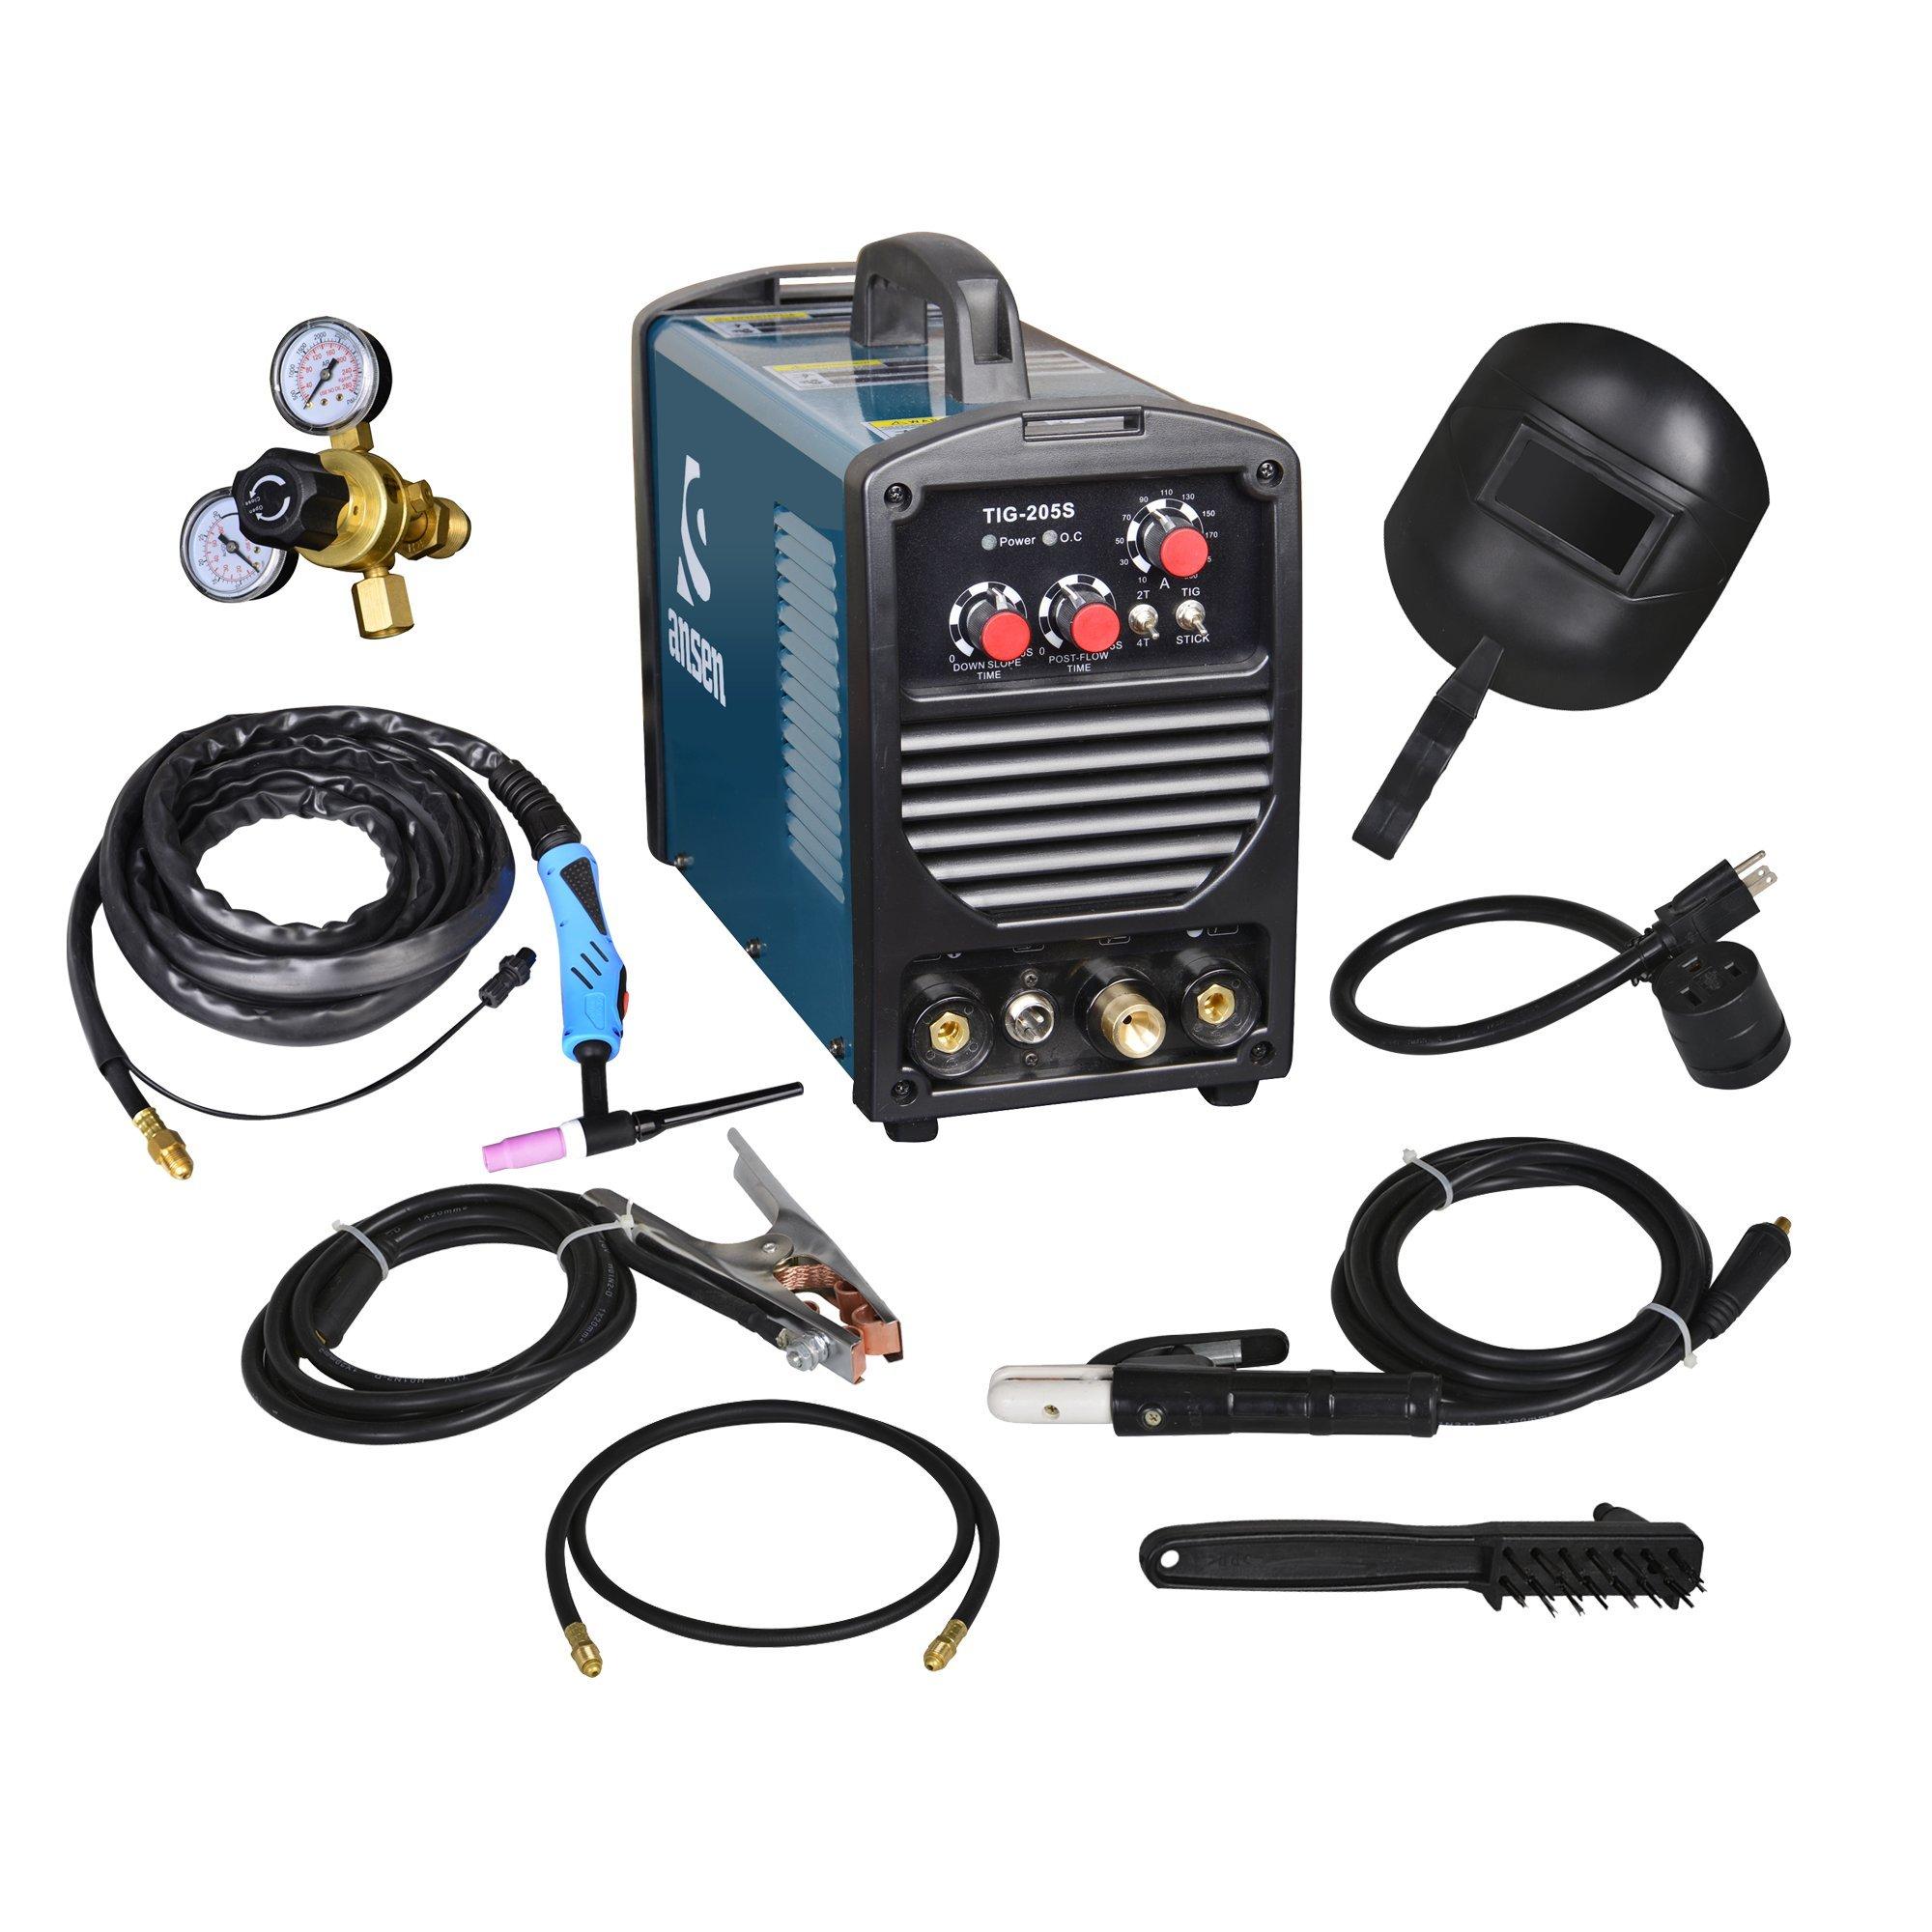 Ansen Portable IGBT Inverter Welder 115V/230V Dual Voltage TIG&STICK DC Welding Machine (200AMP)